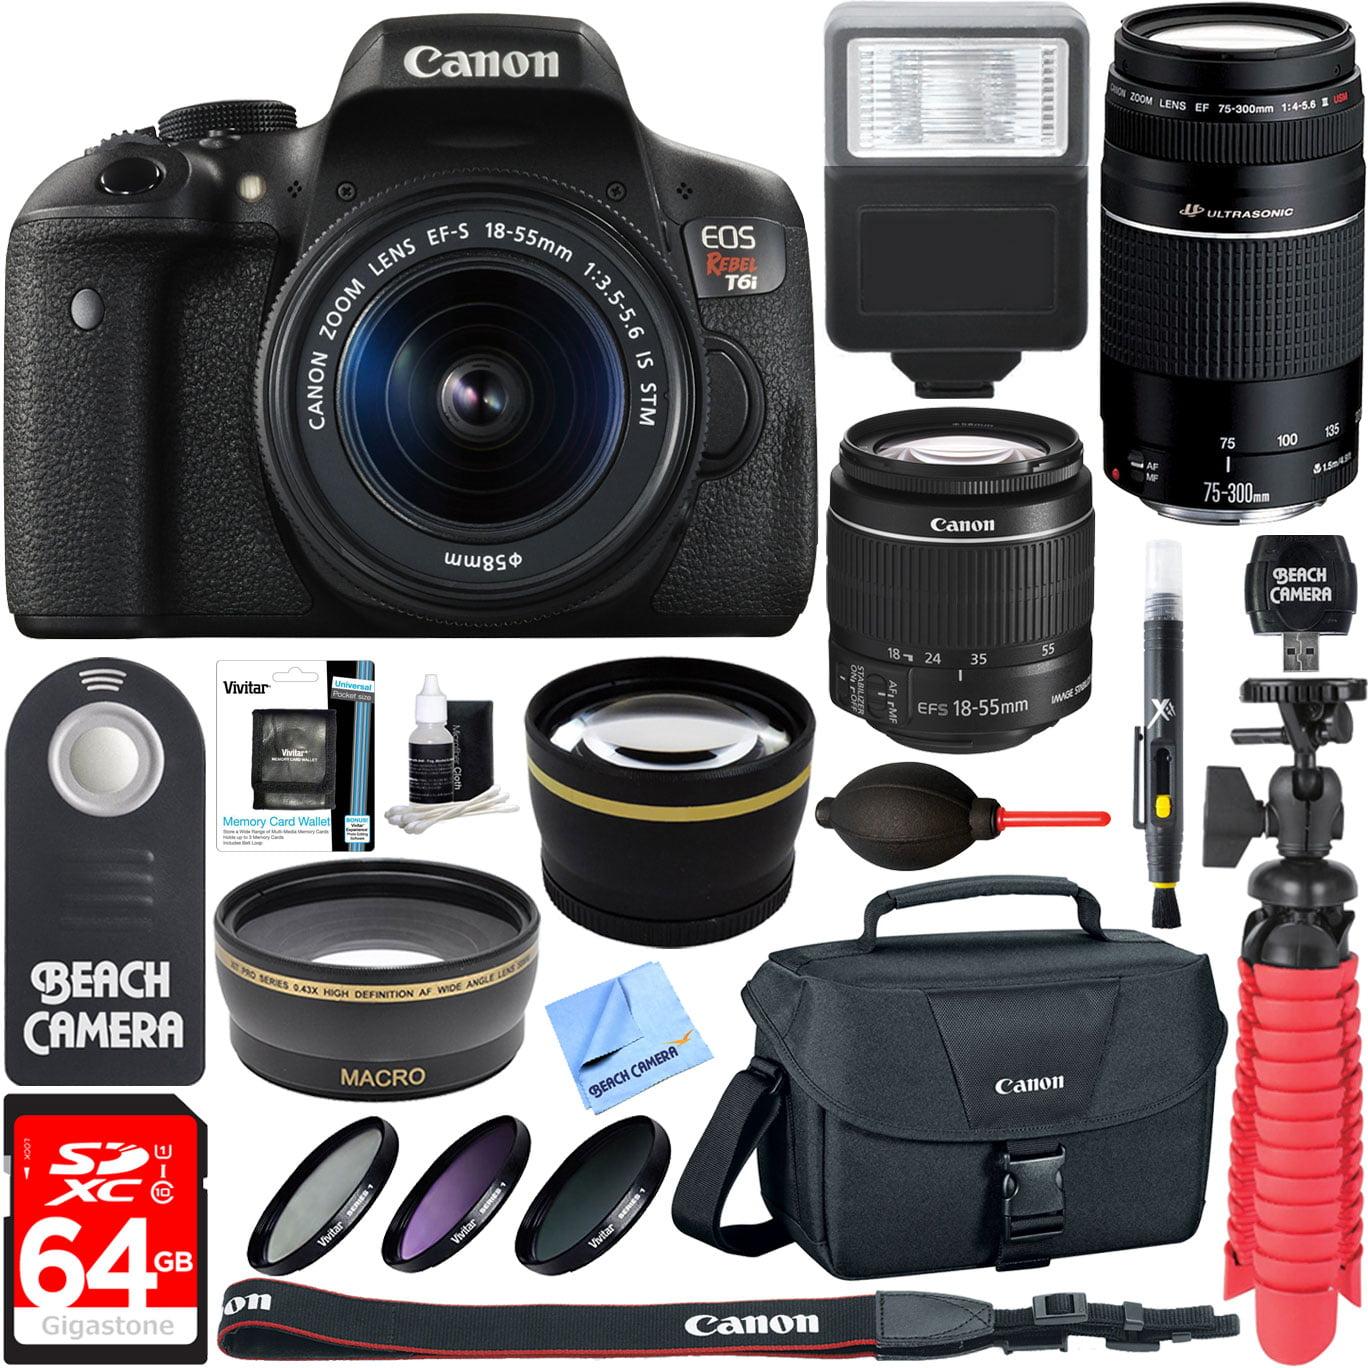 Canon T6i EOS Rebel DSLR Camera w/ EF-S 18-55mm & 75-300